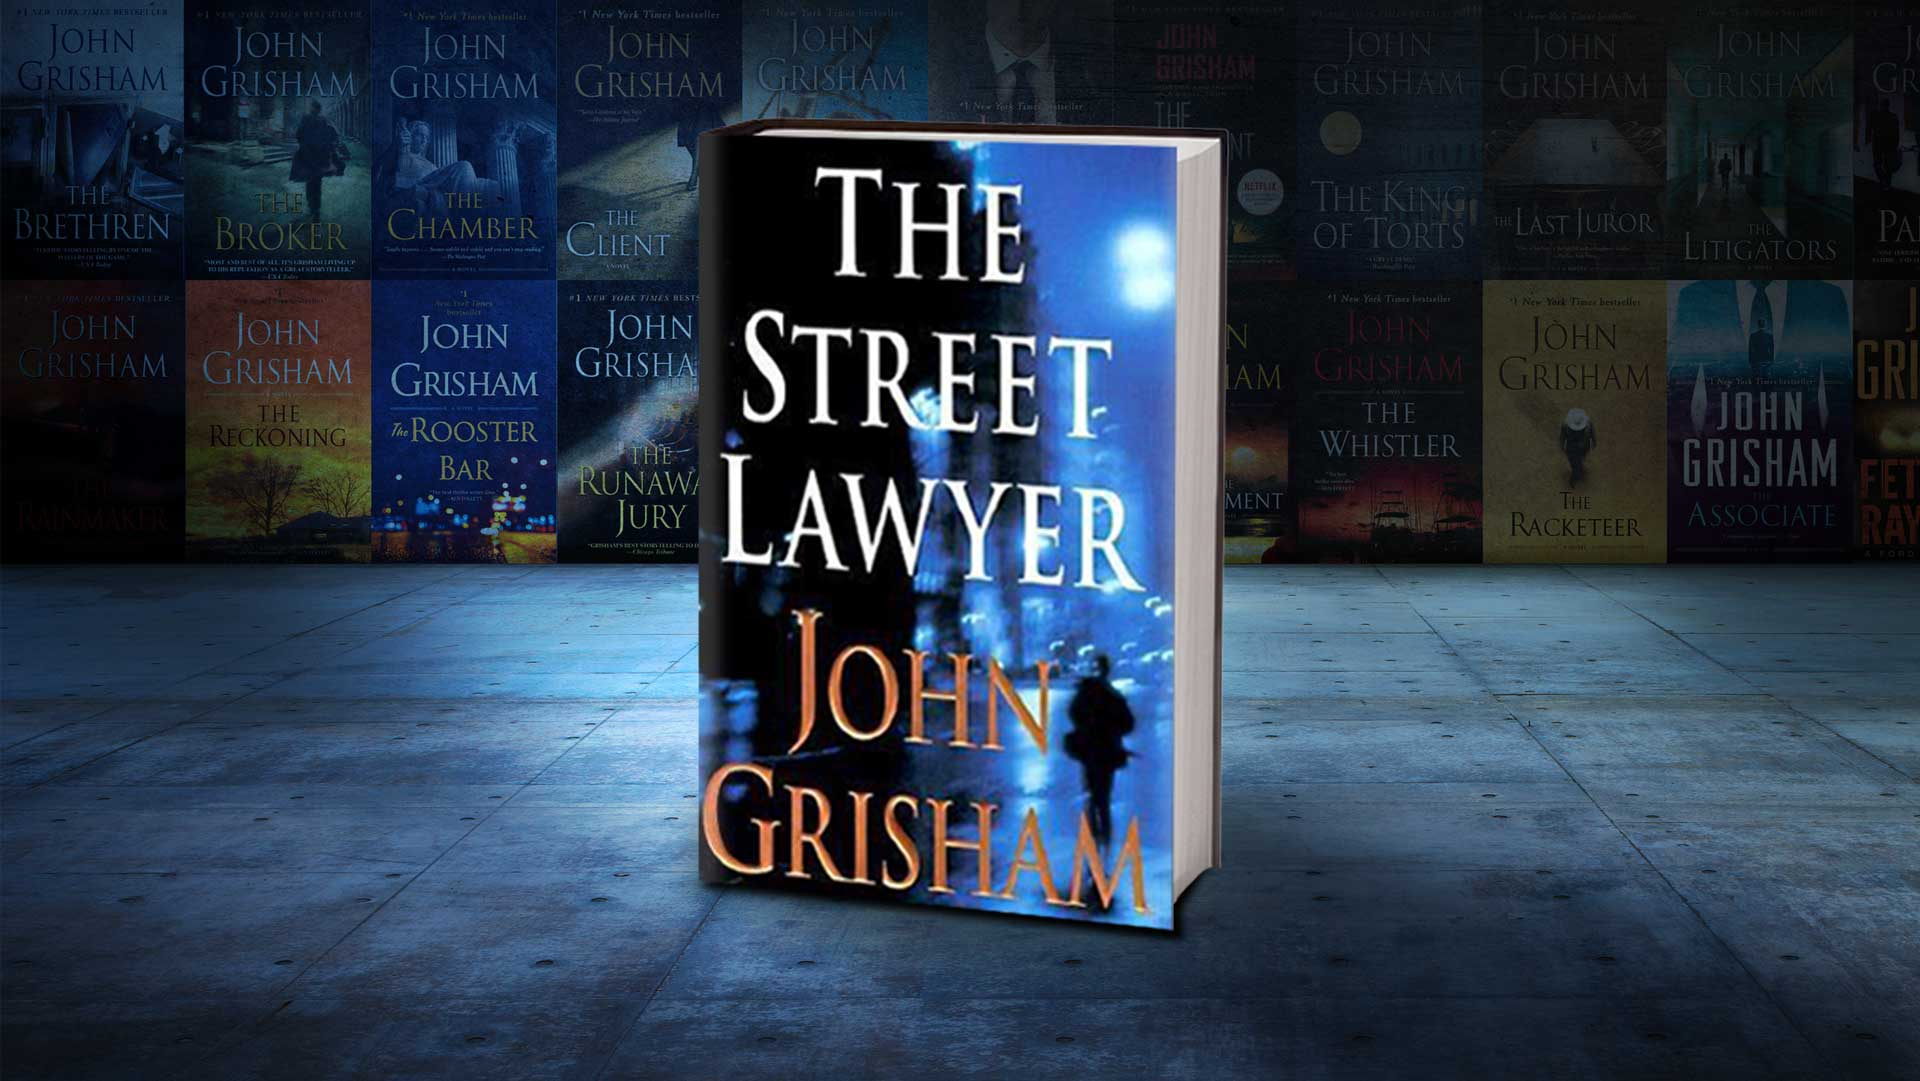 The Street Lawyer – John Grisham